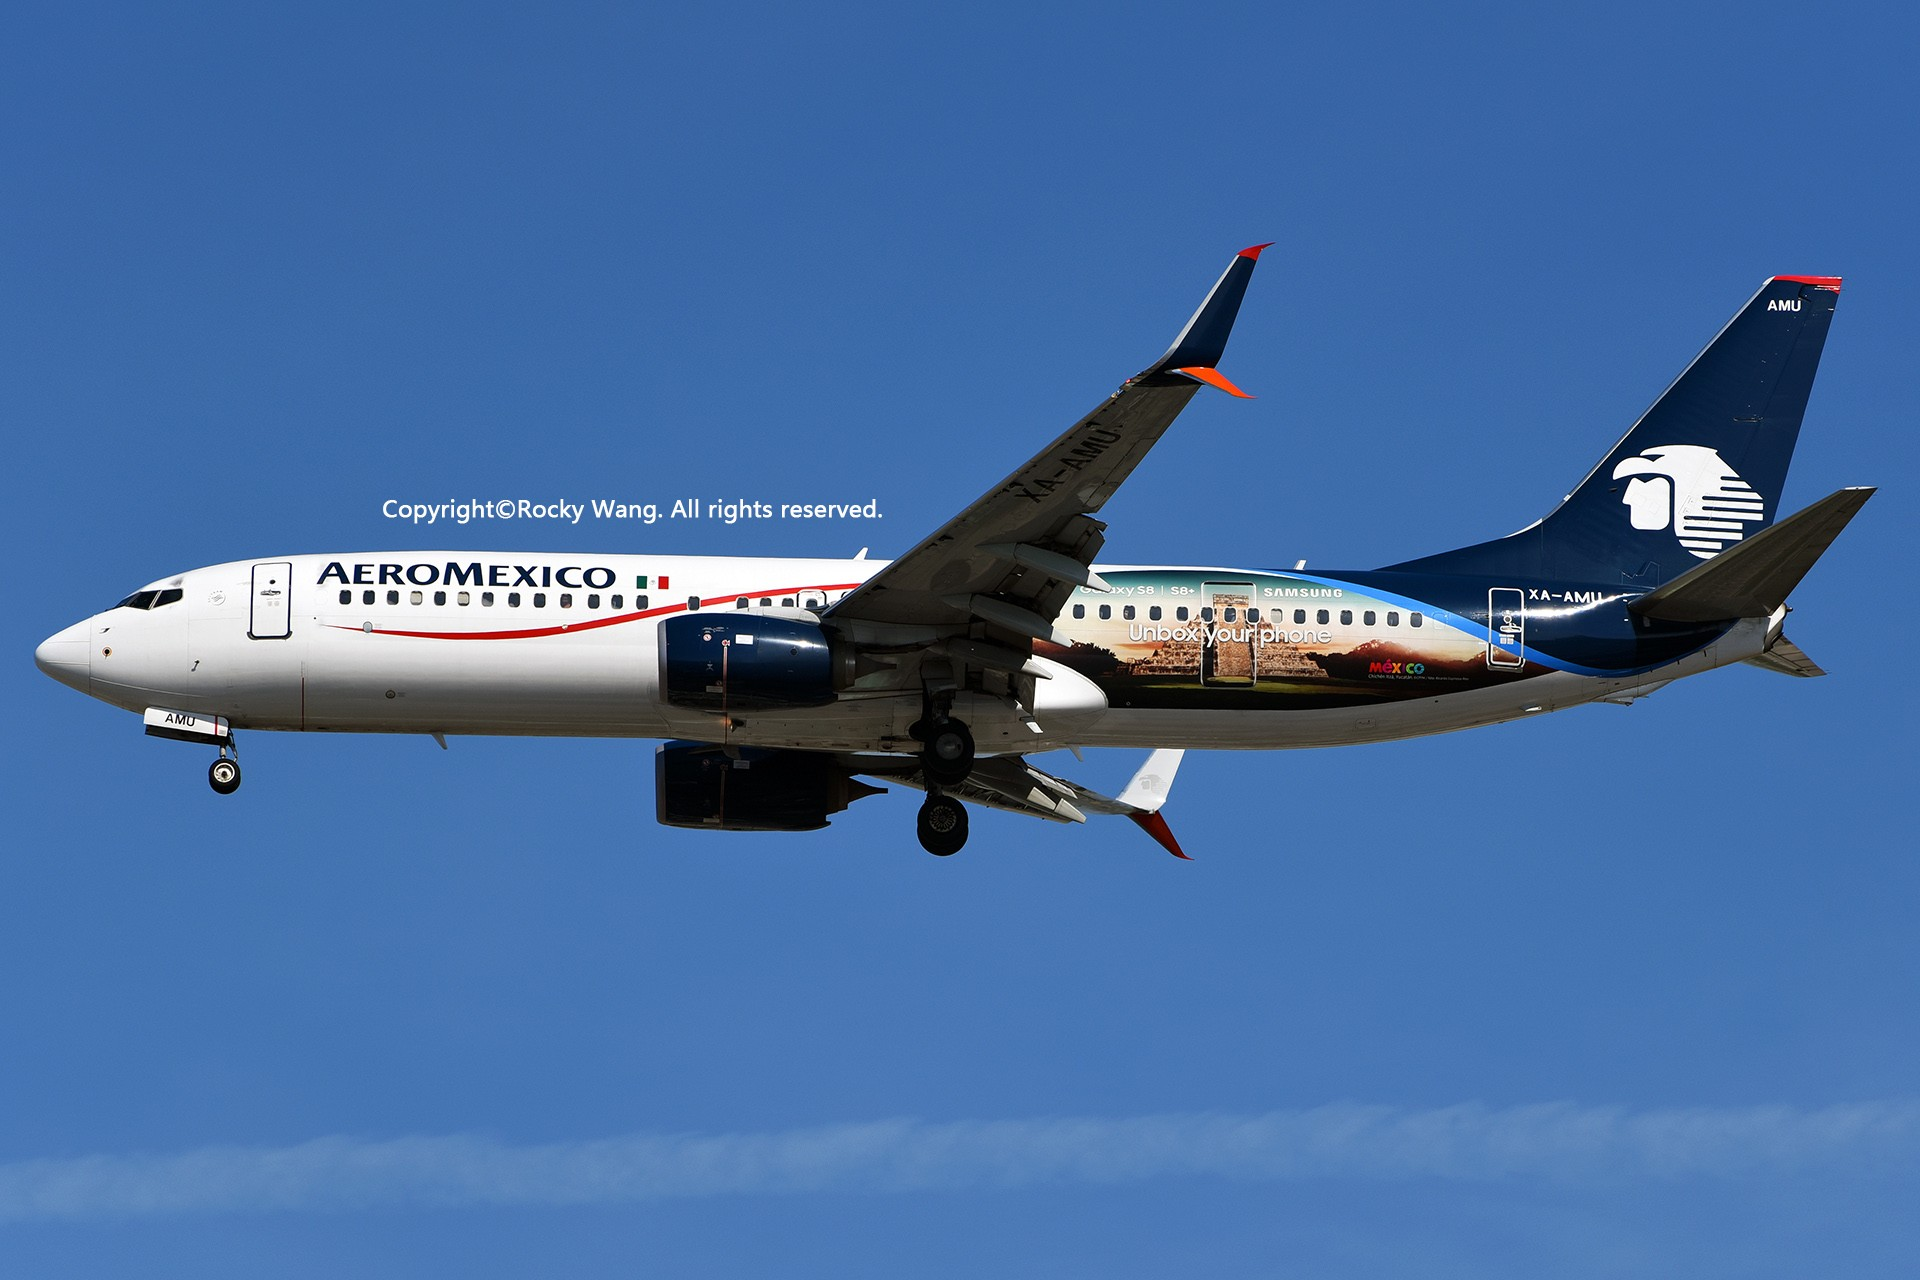 Re:[原创]KMIA 30图 BOEING 737-852 XA-AMU Miami Int'l Airport